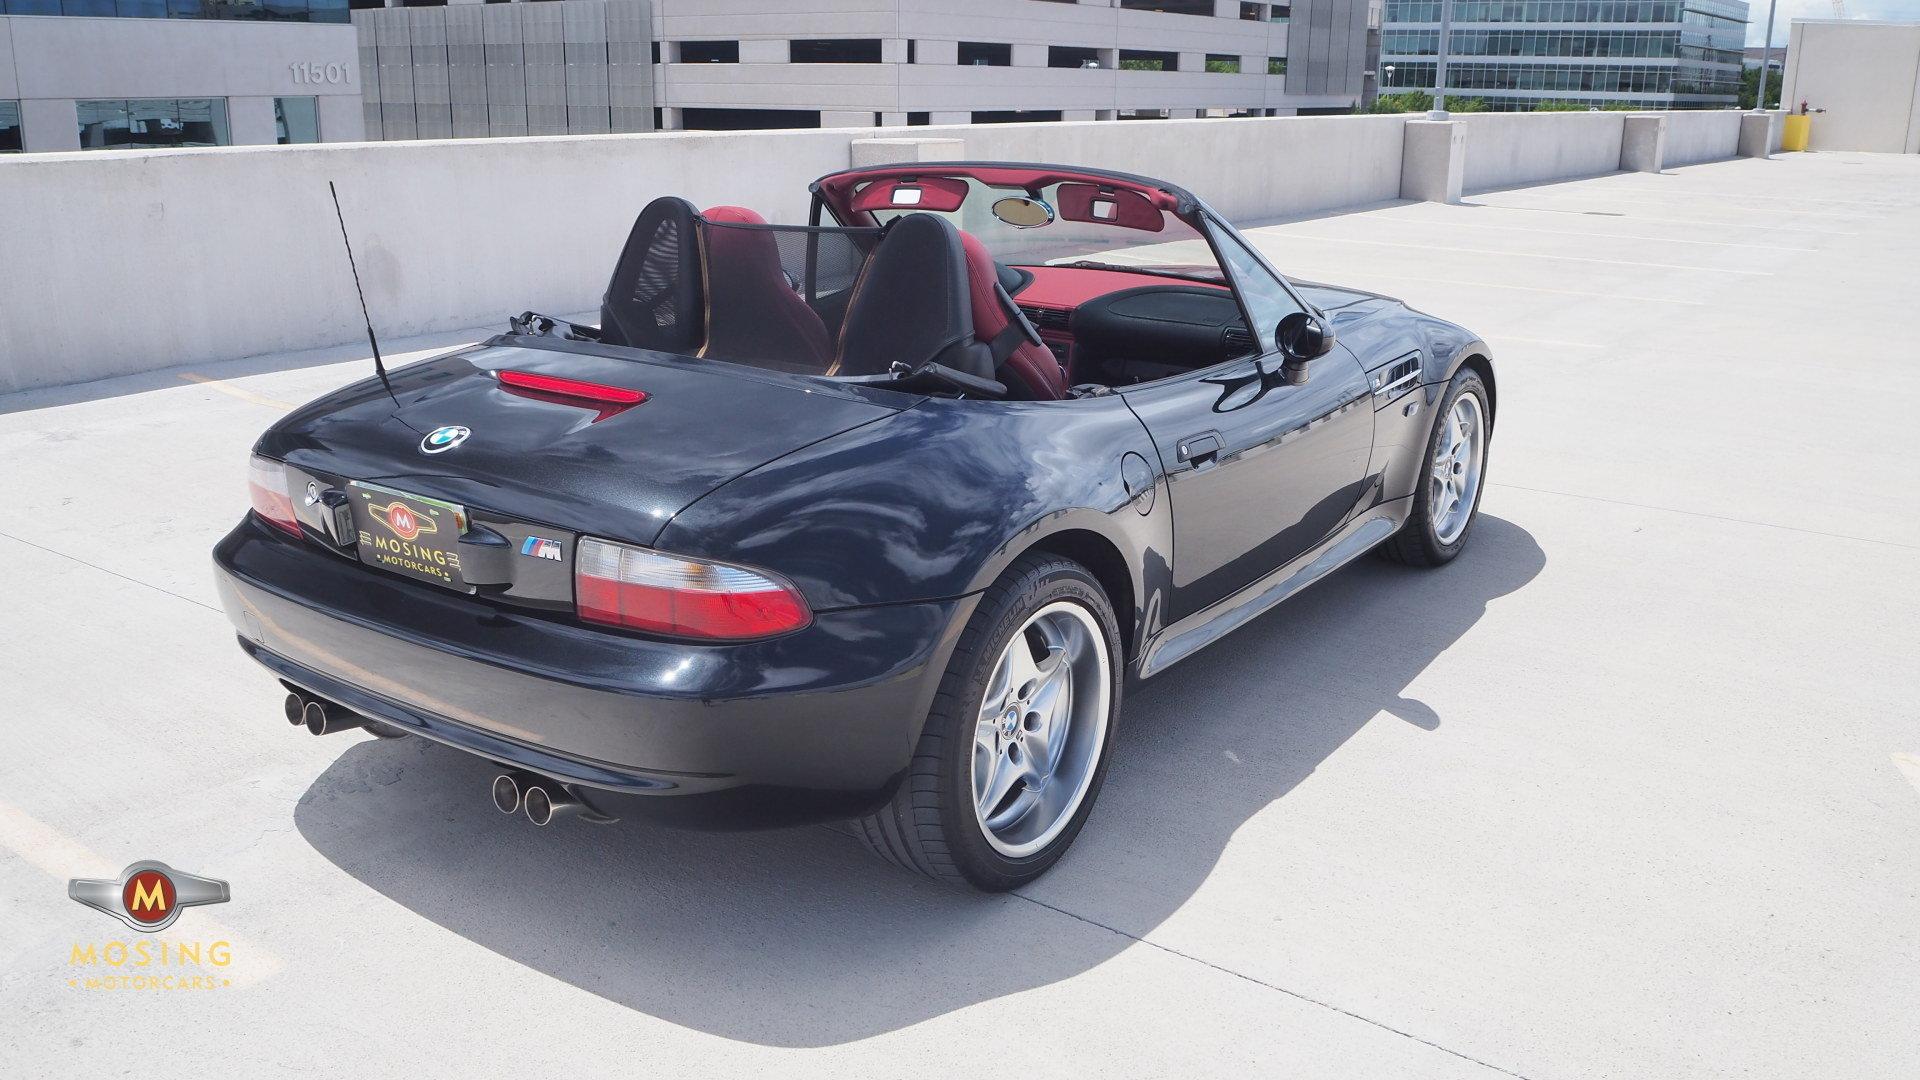 2001 Bmw Z3 M Roadster S54 Mosing Motorcars